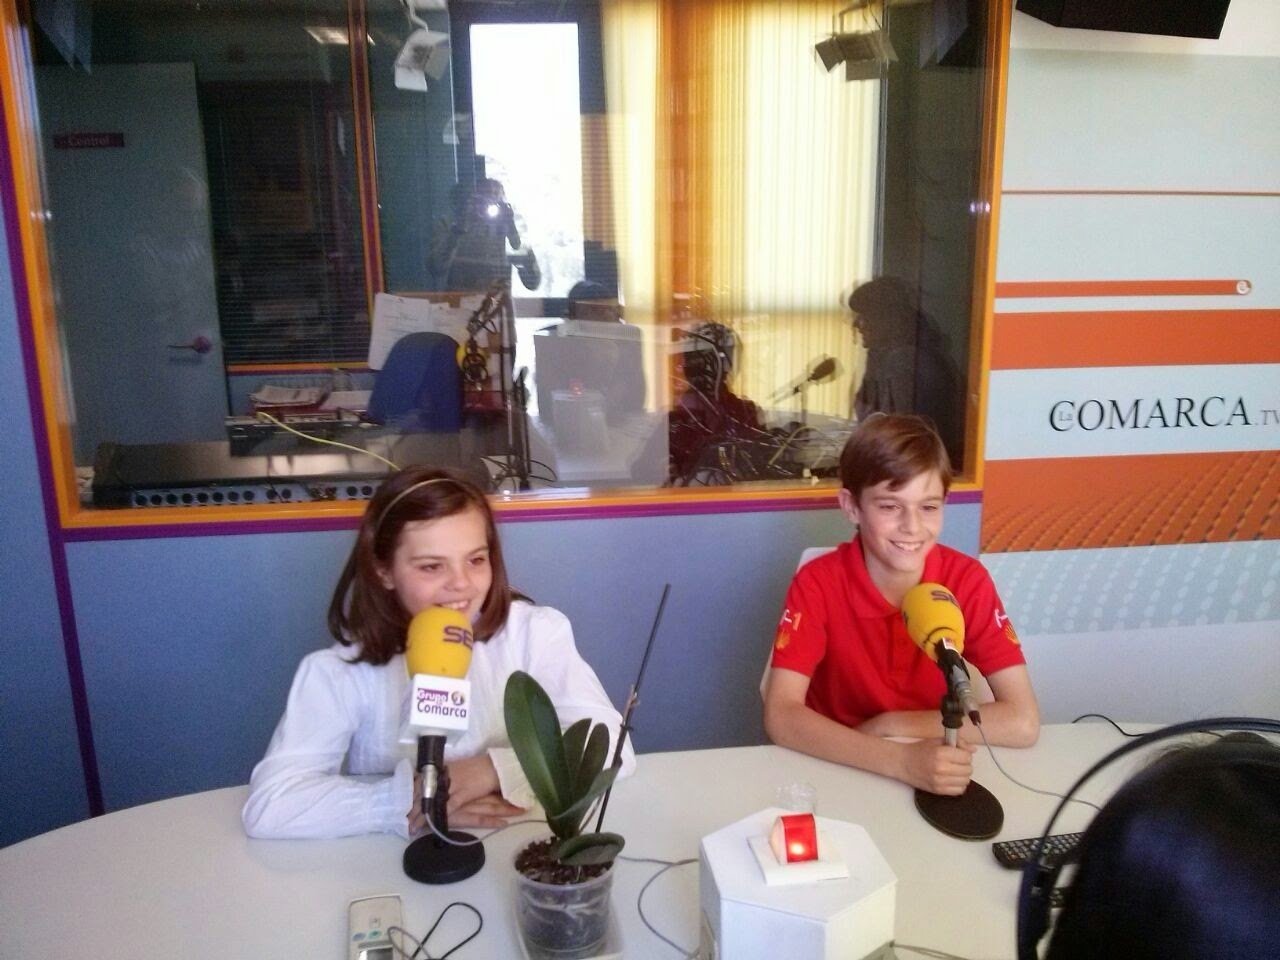 http://lacomarca.net/radio/radio-la-comarca/item/7544-hoy-es-tu-dia